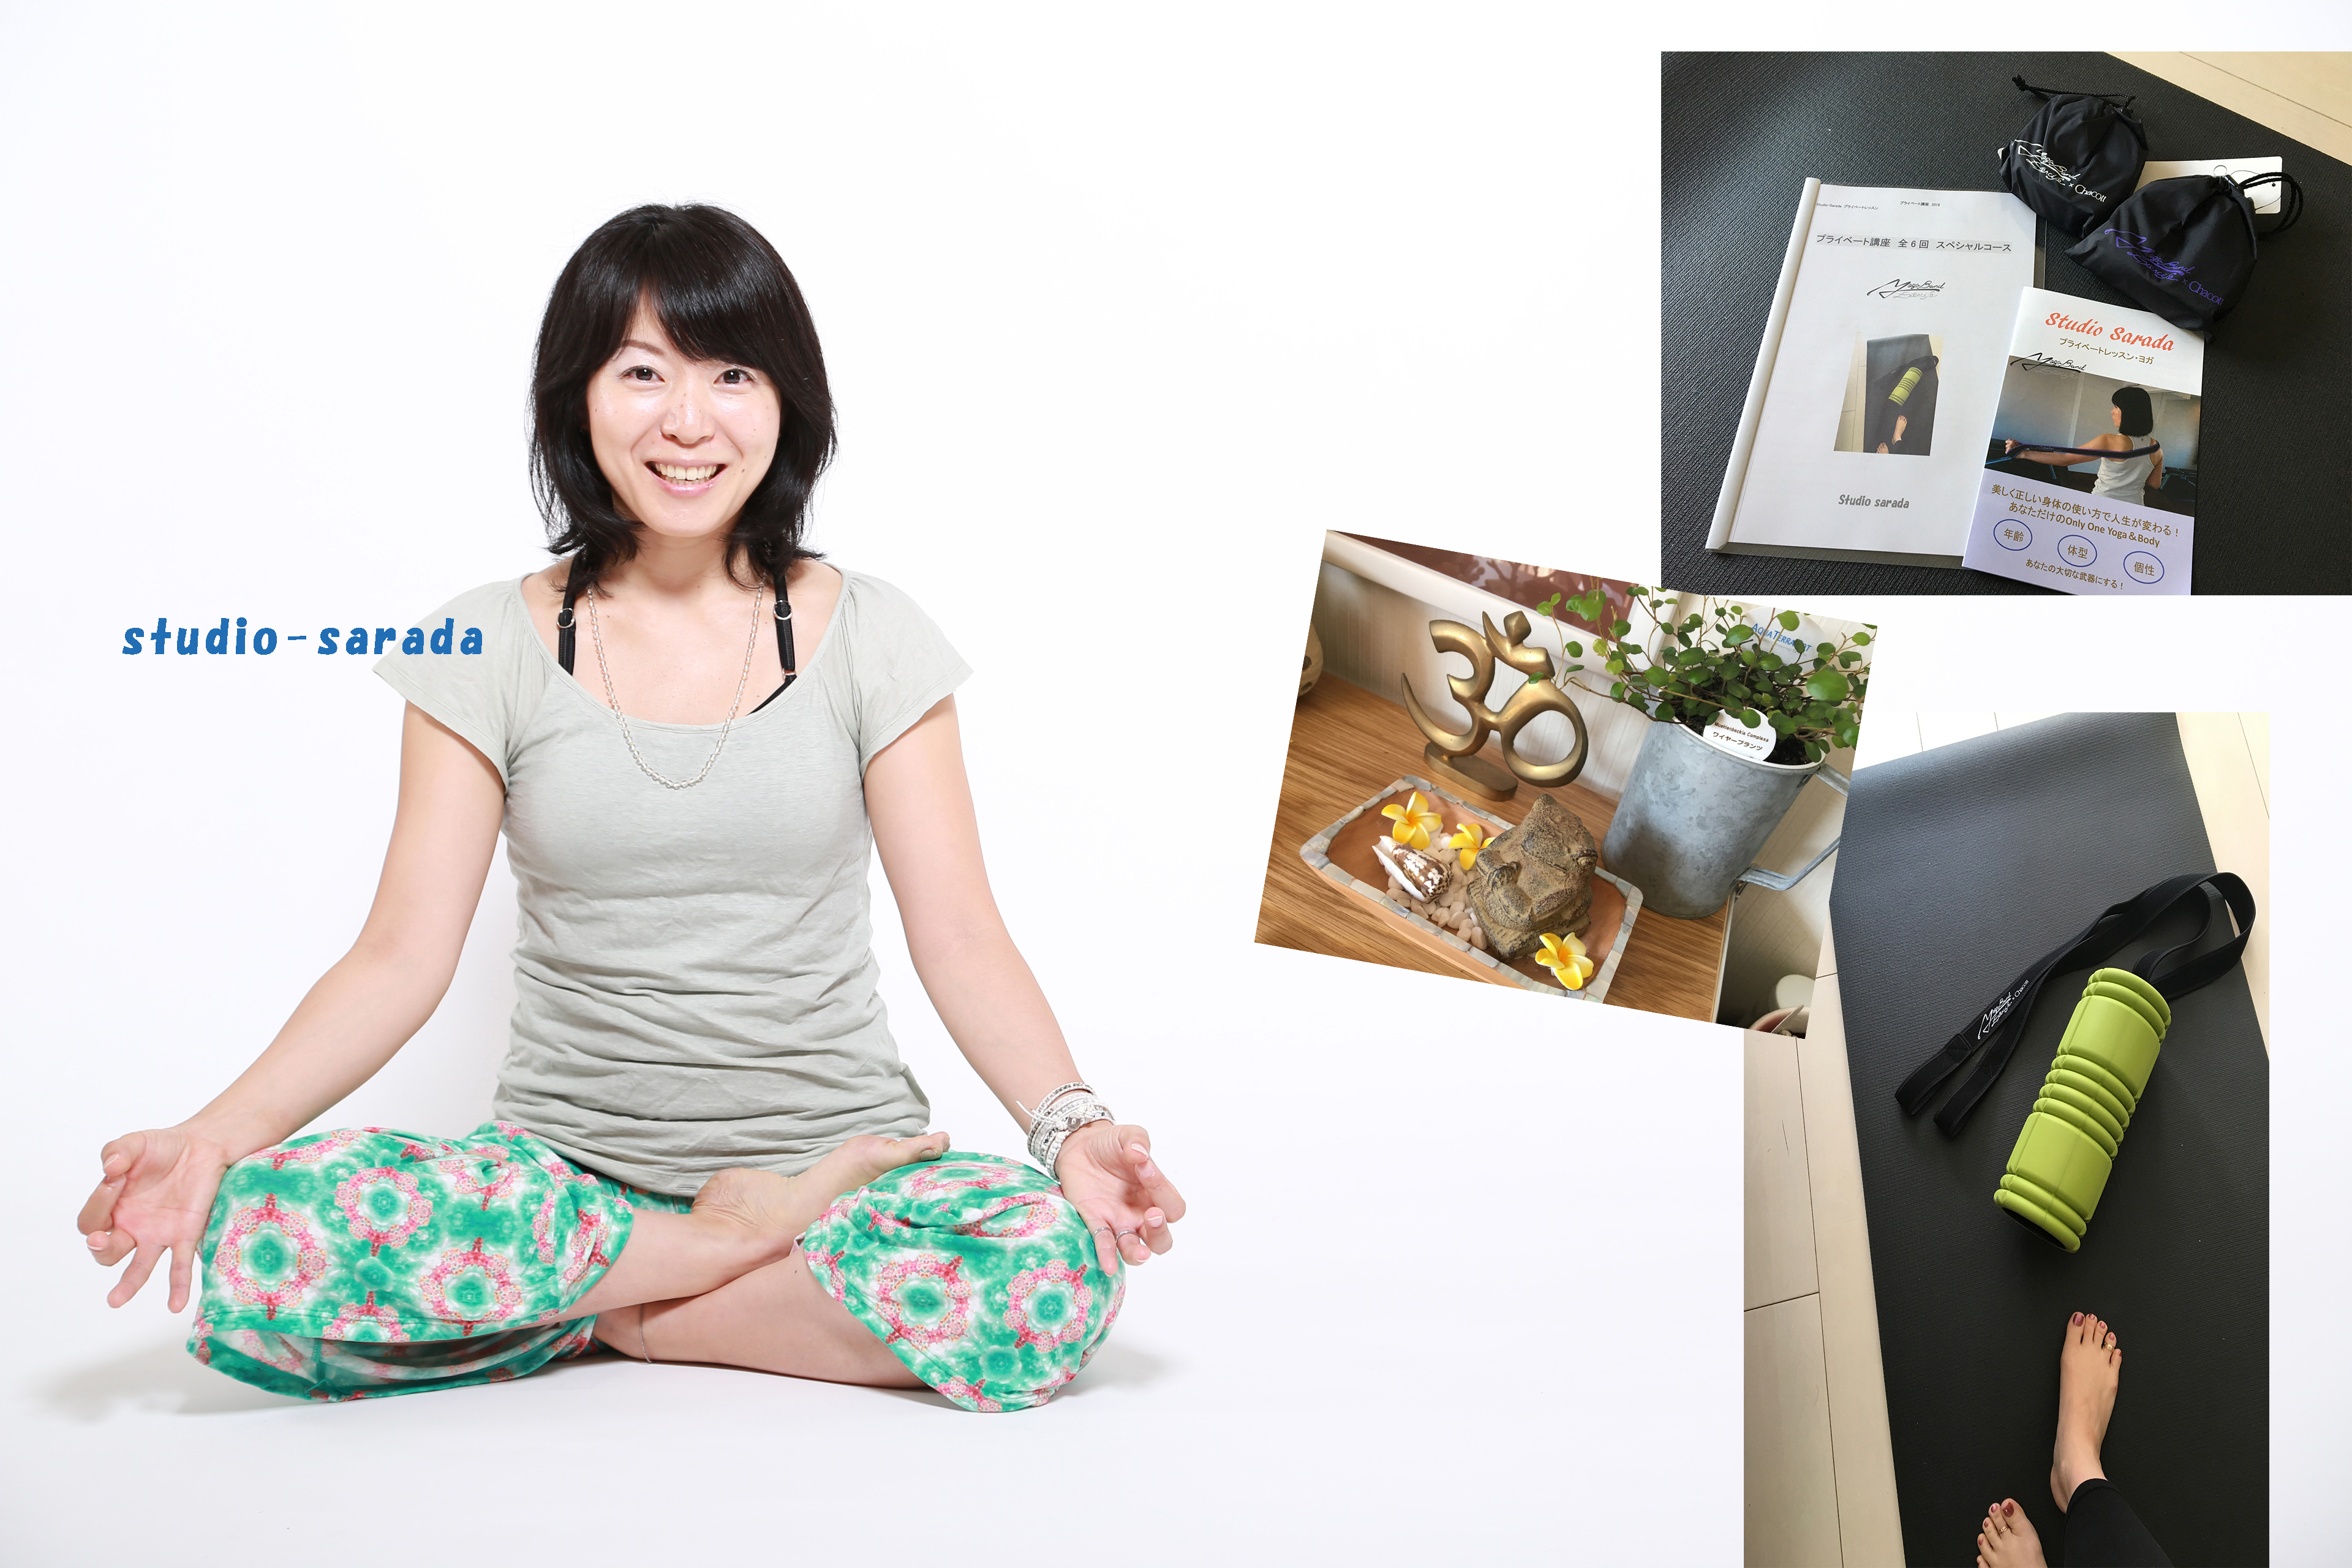 studio-sarada  プライベートヨガ専用スタジオ 横浜市保土ヶ谷区